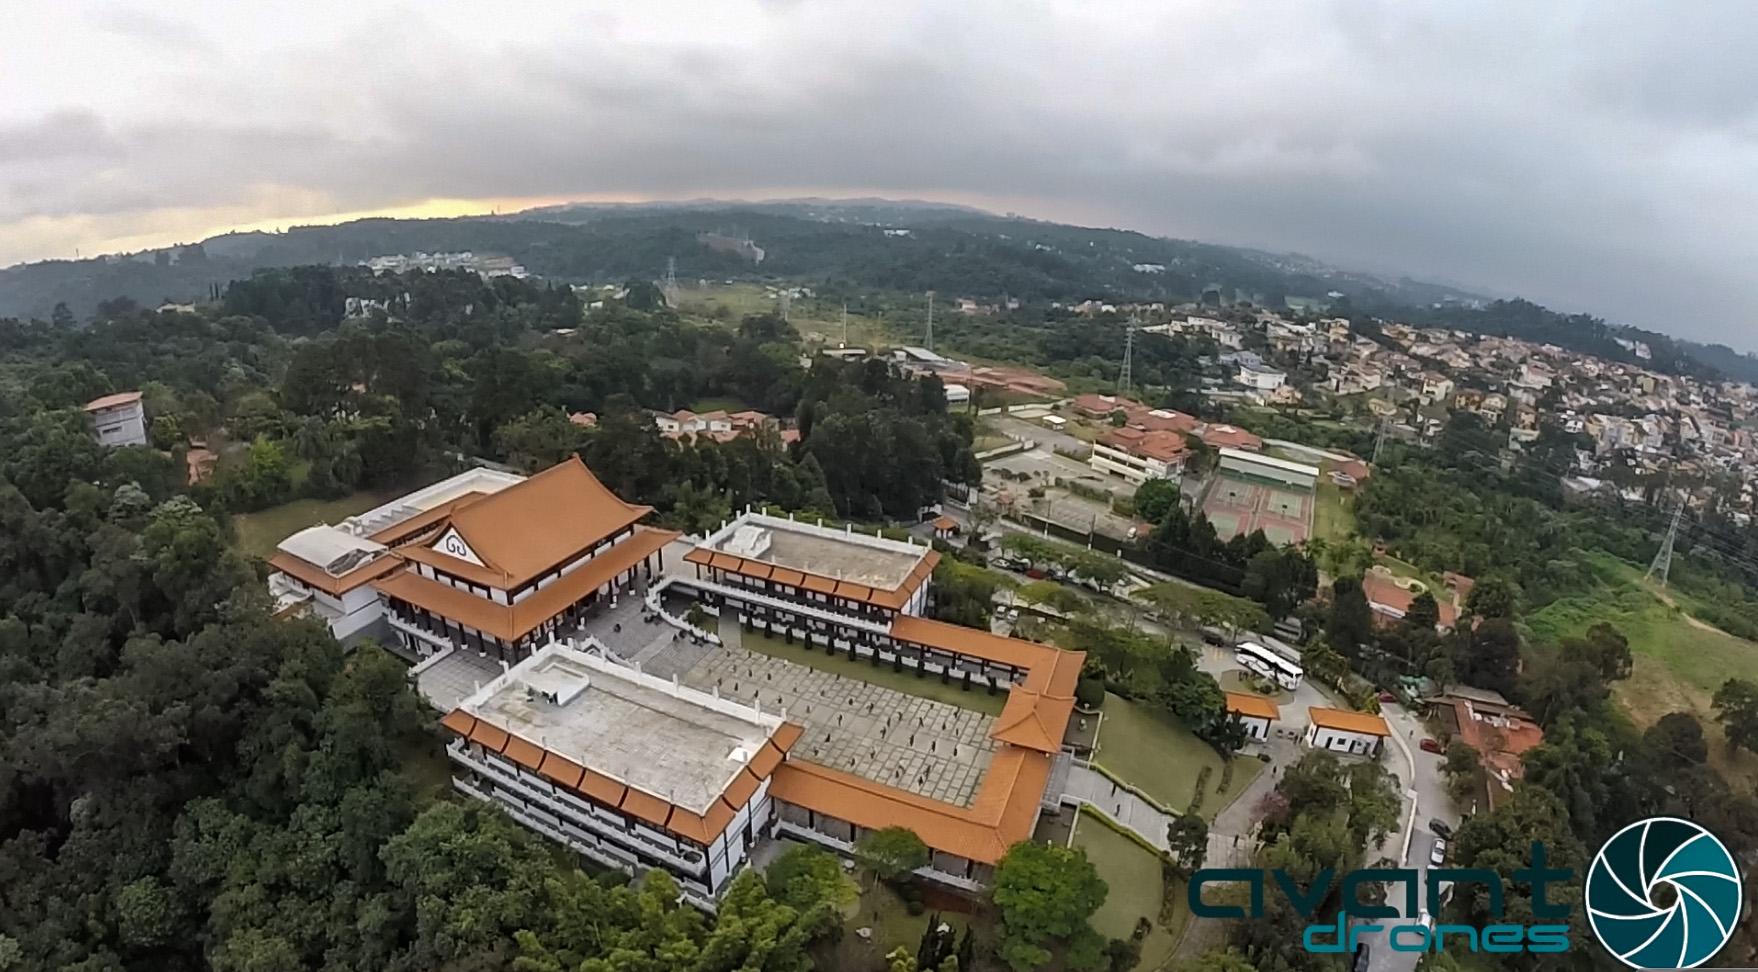 Imagem Aérea Templo Zu Lai